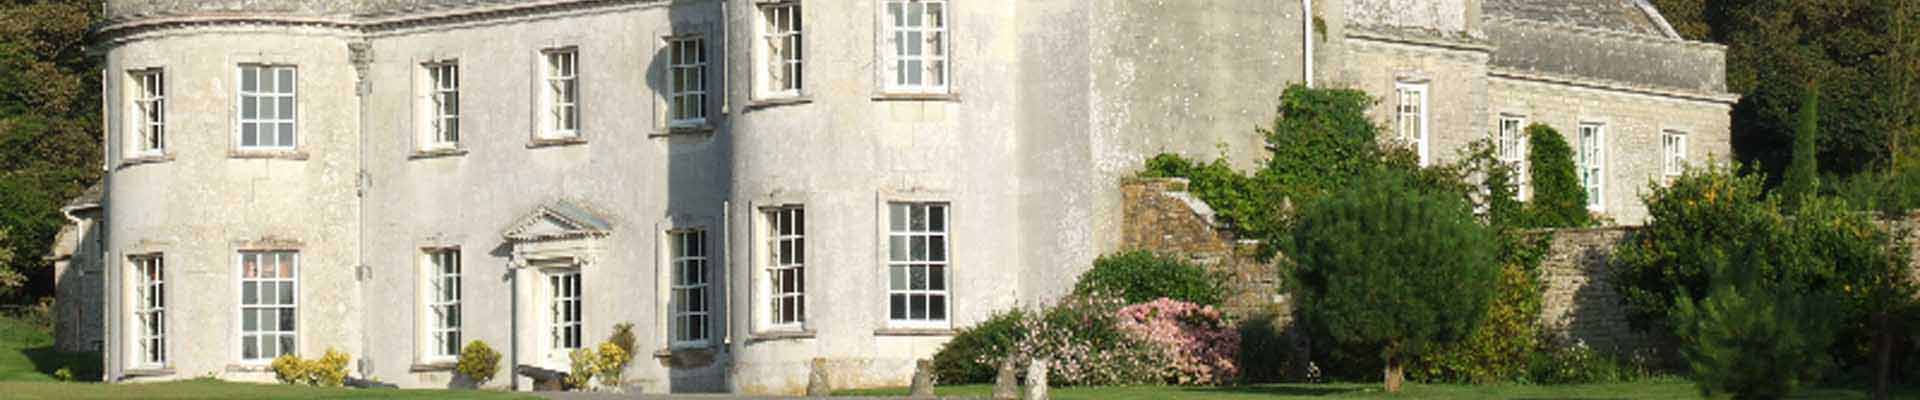 Greyholme Manor